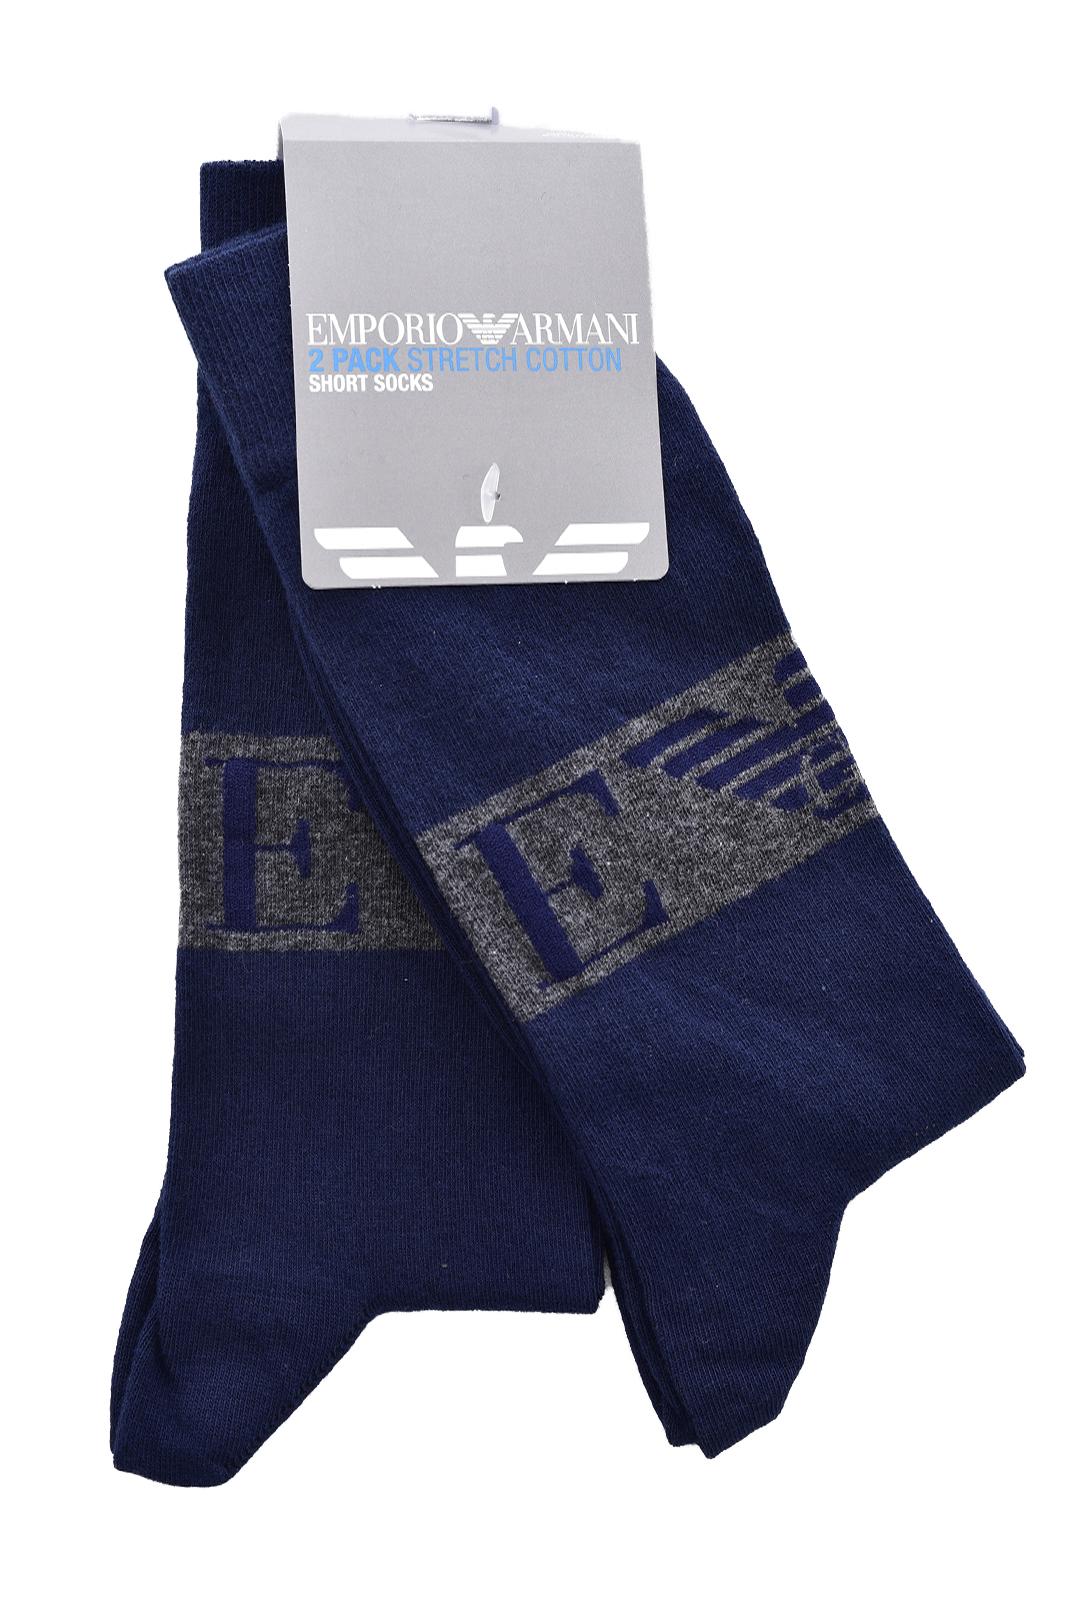 Chaussettes  Emporio armani 302302 8A240 43335 BLU/BLU